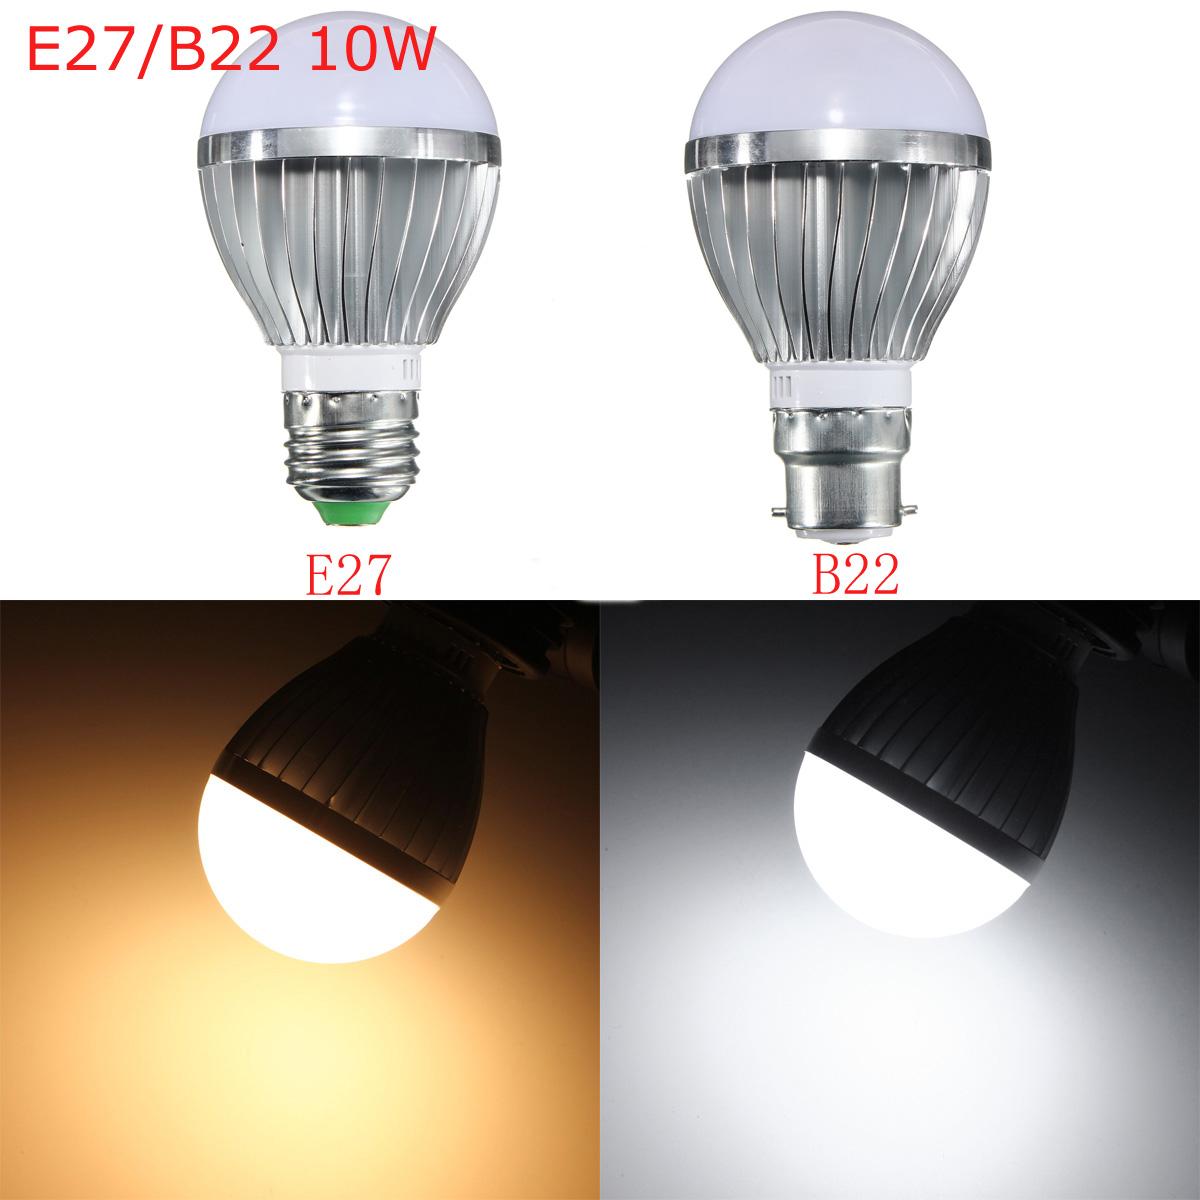 e27 b22 10w dimmable 14 smd5730 led bayonet edison bulb lamp globe light warm white ac 110 240v. Black Bedroom Furniture Sets. Home Design Ideas